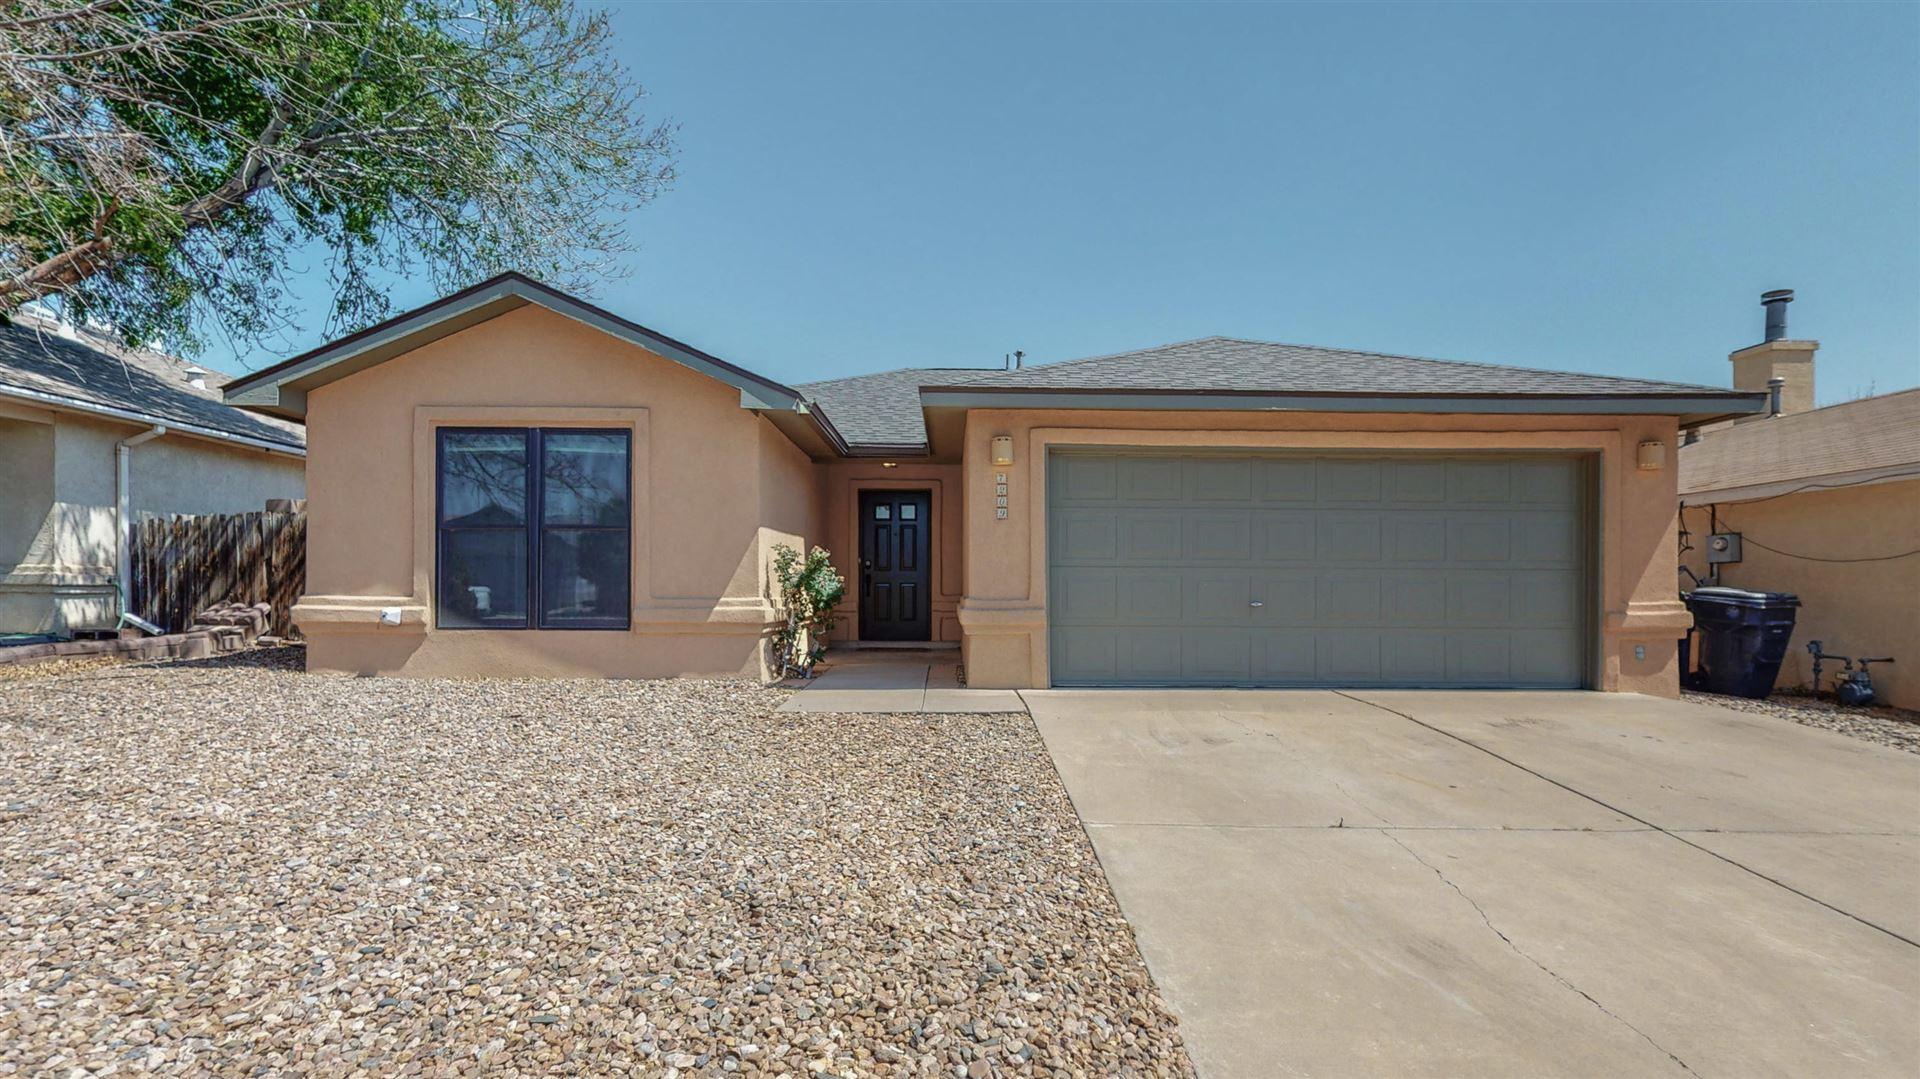 Photo of 7209 Way Cross Avenue NW, Albuquerque, NM 87120 (MLS # 994644)